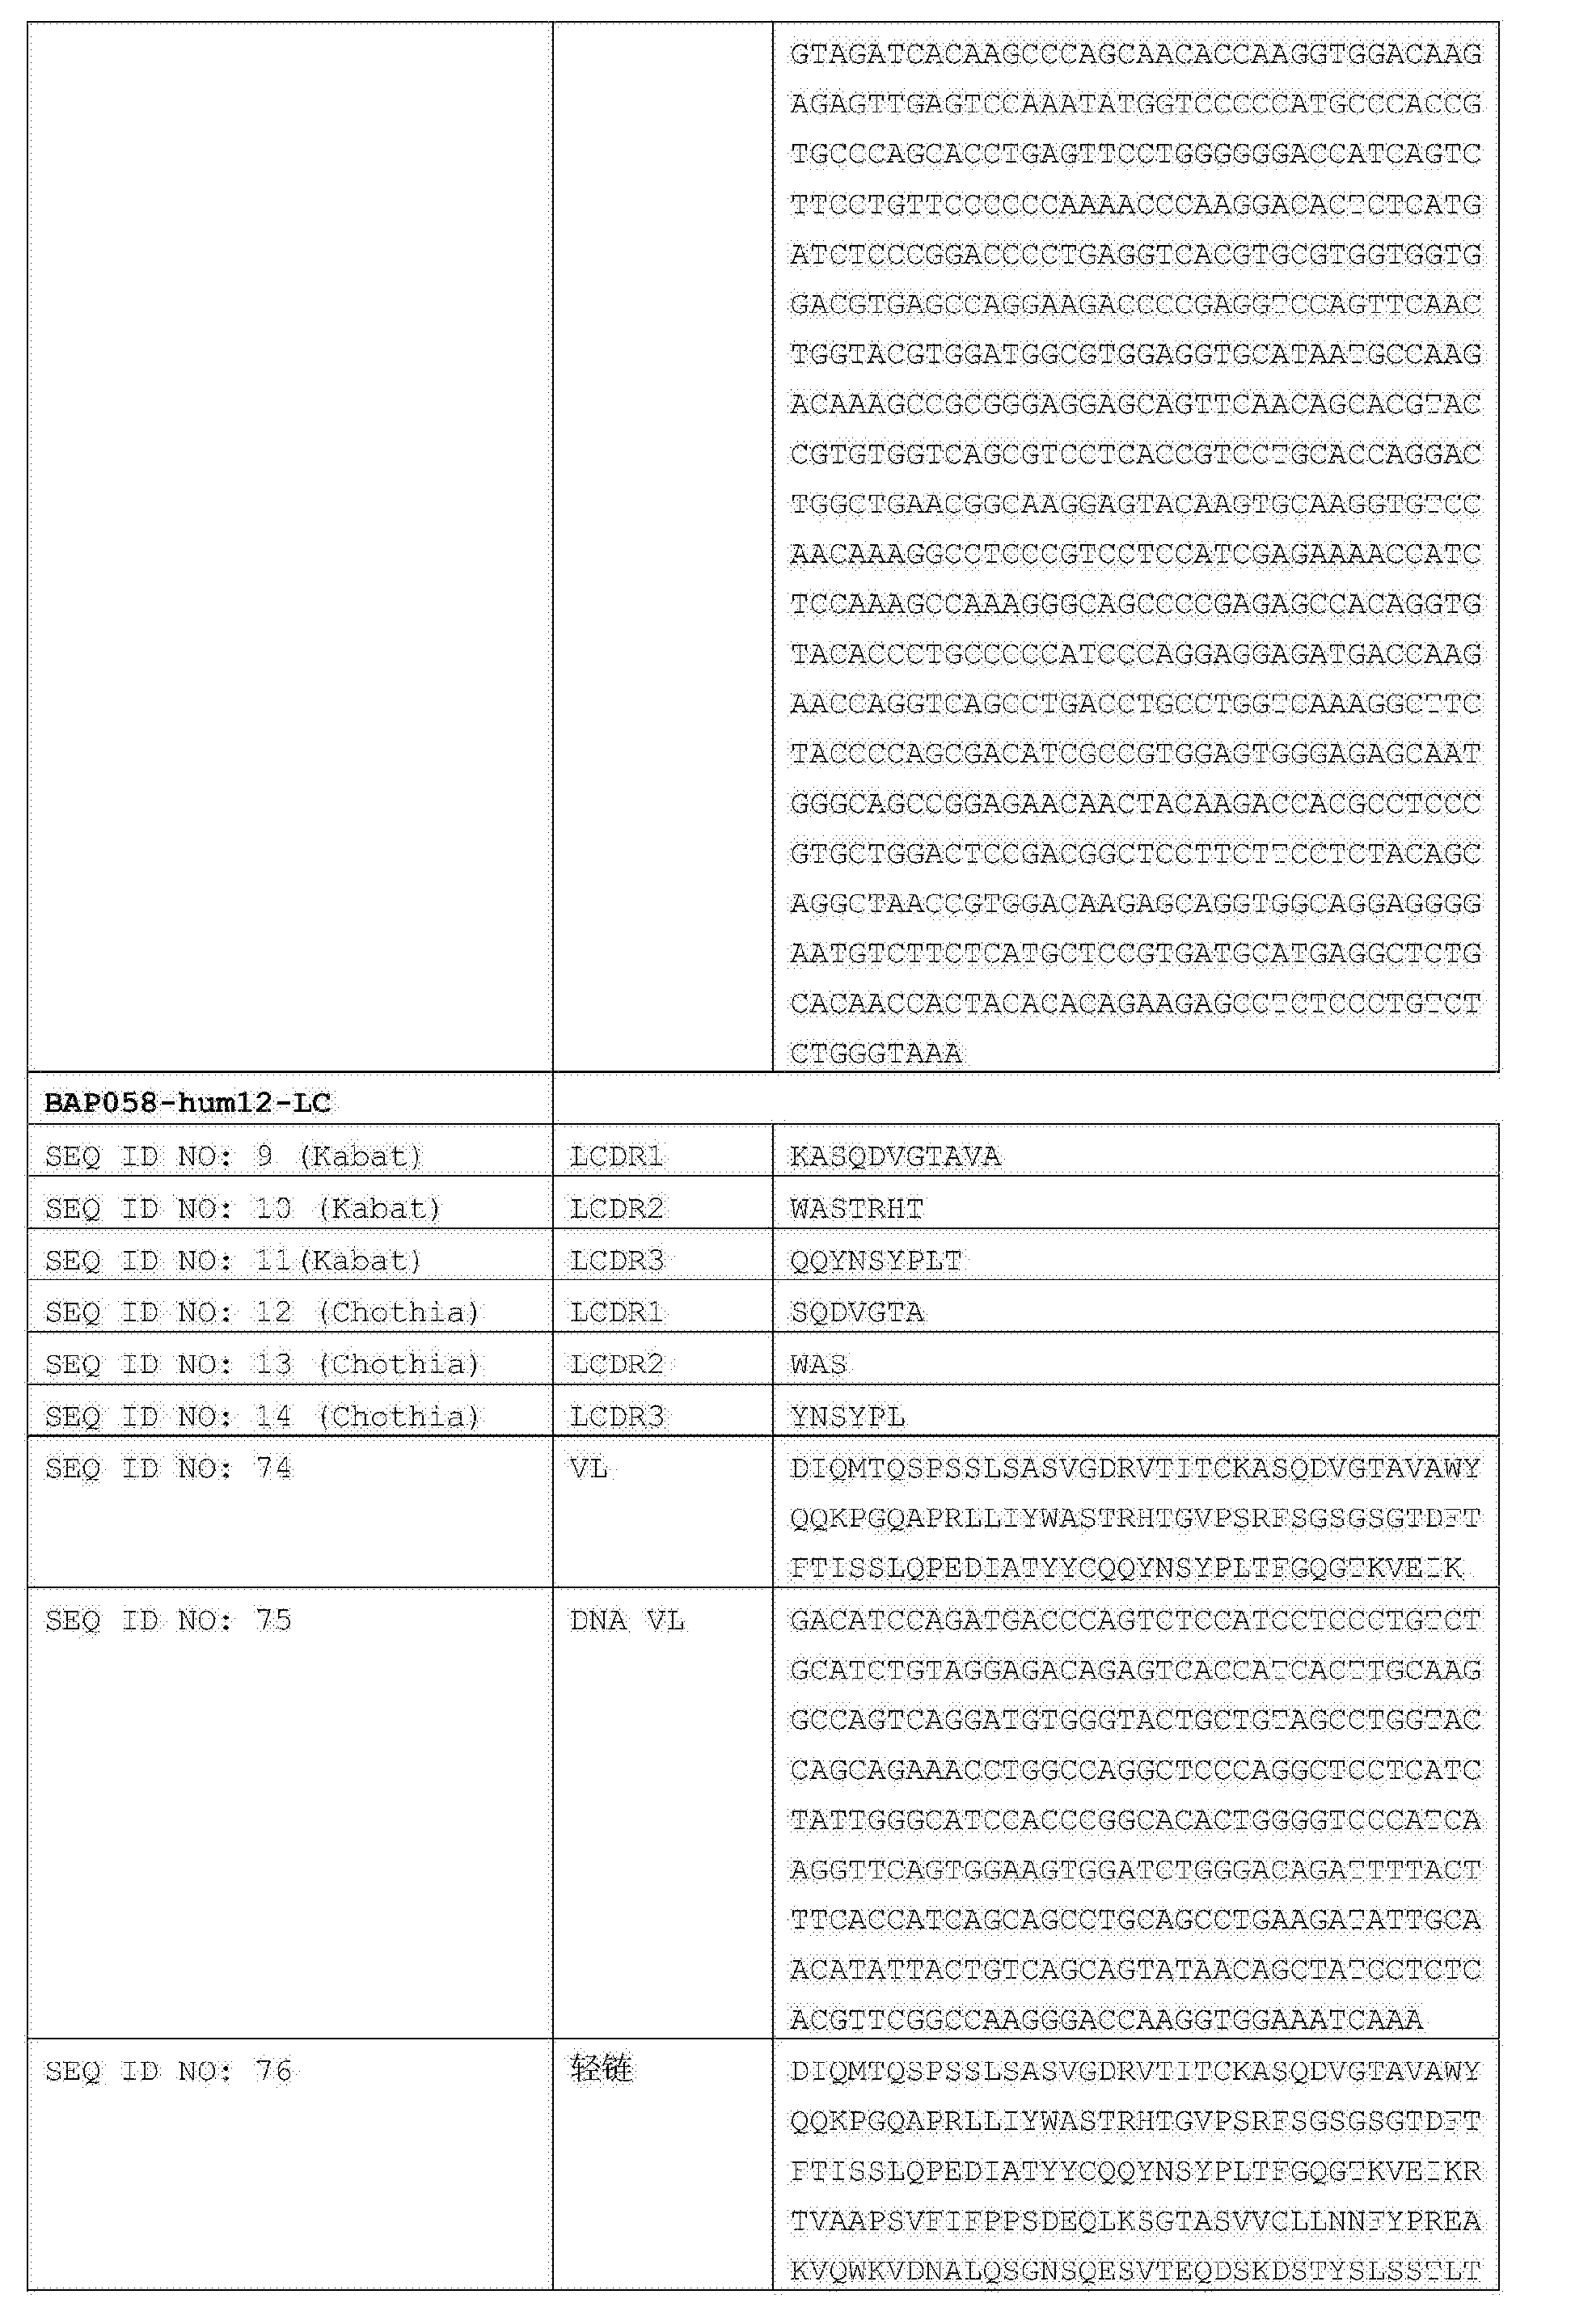 search q eb b6 80 ec 82 b0 ec b6 9c ec 9e a5 eb a7 8c eb 82 a8 e3 80